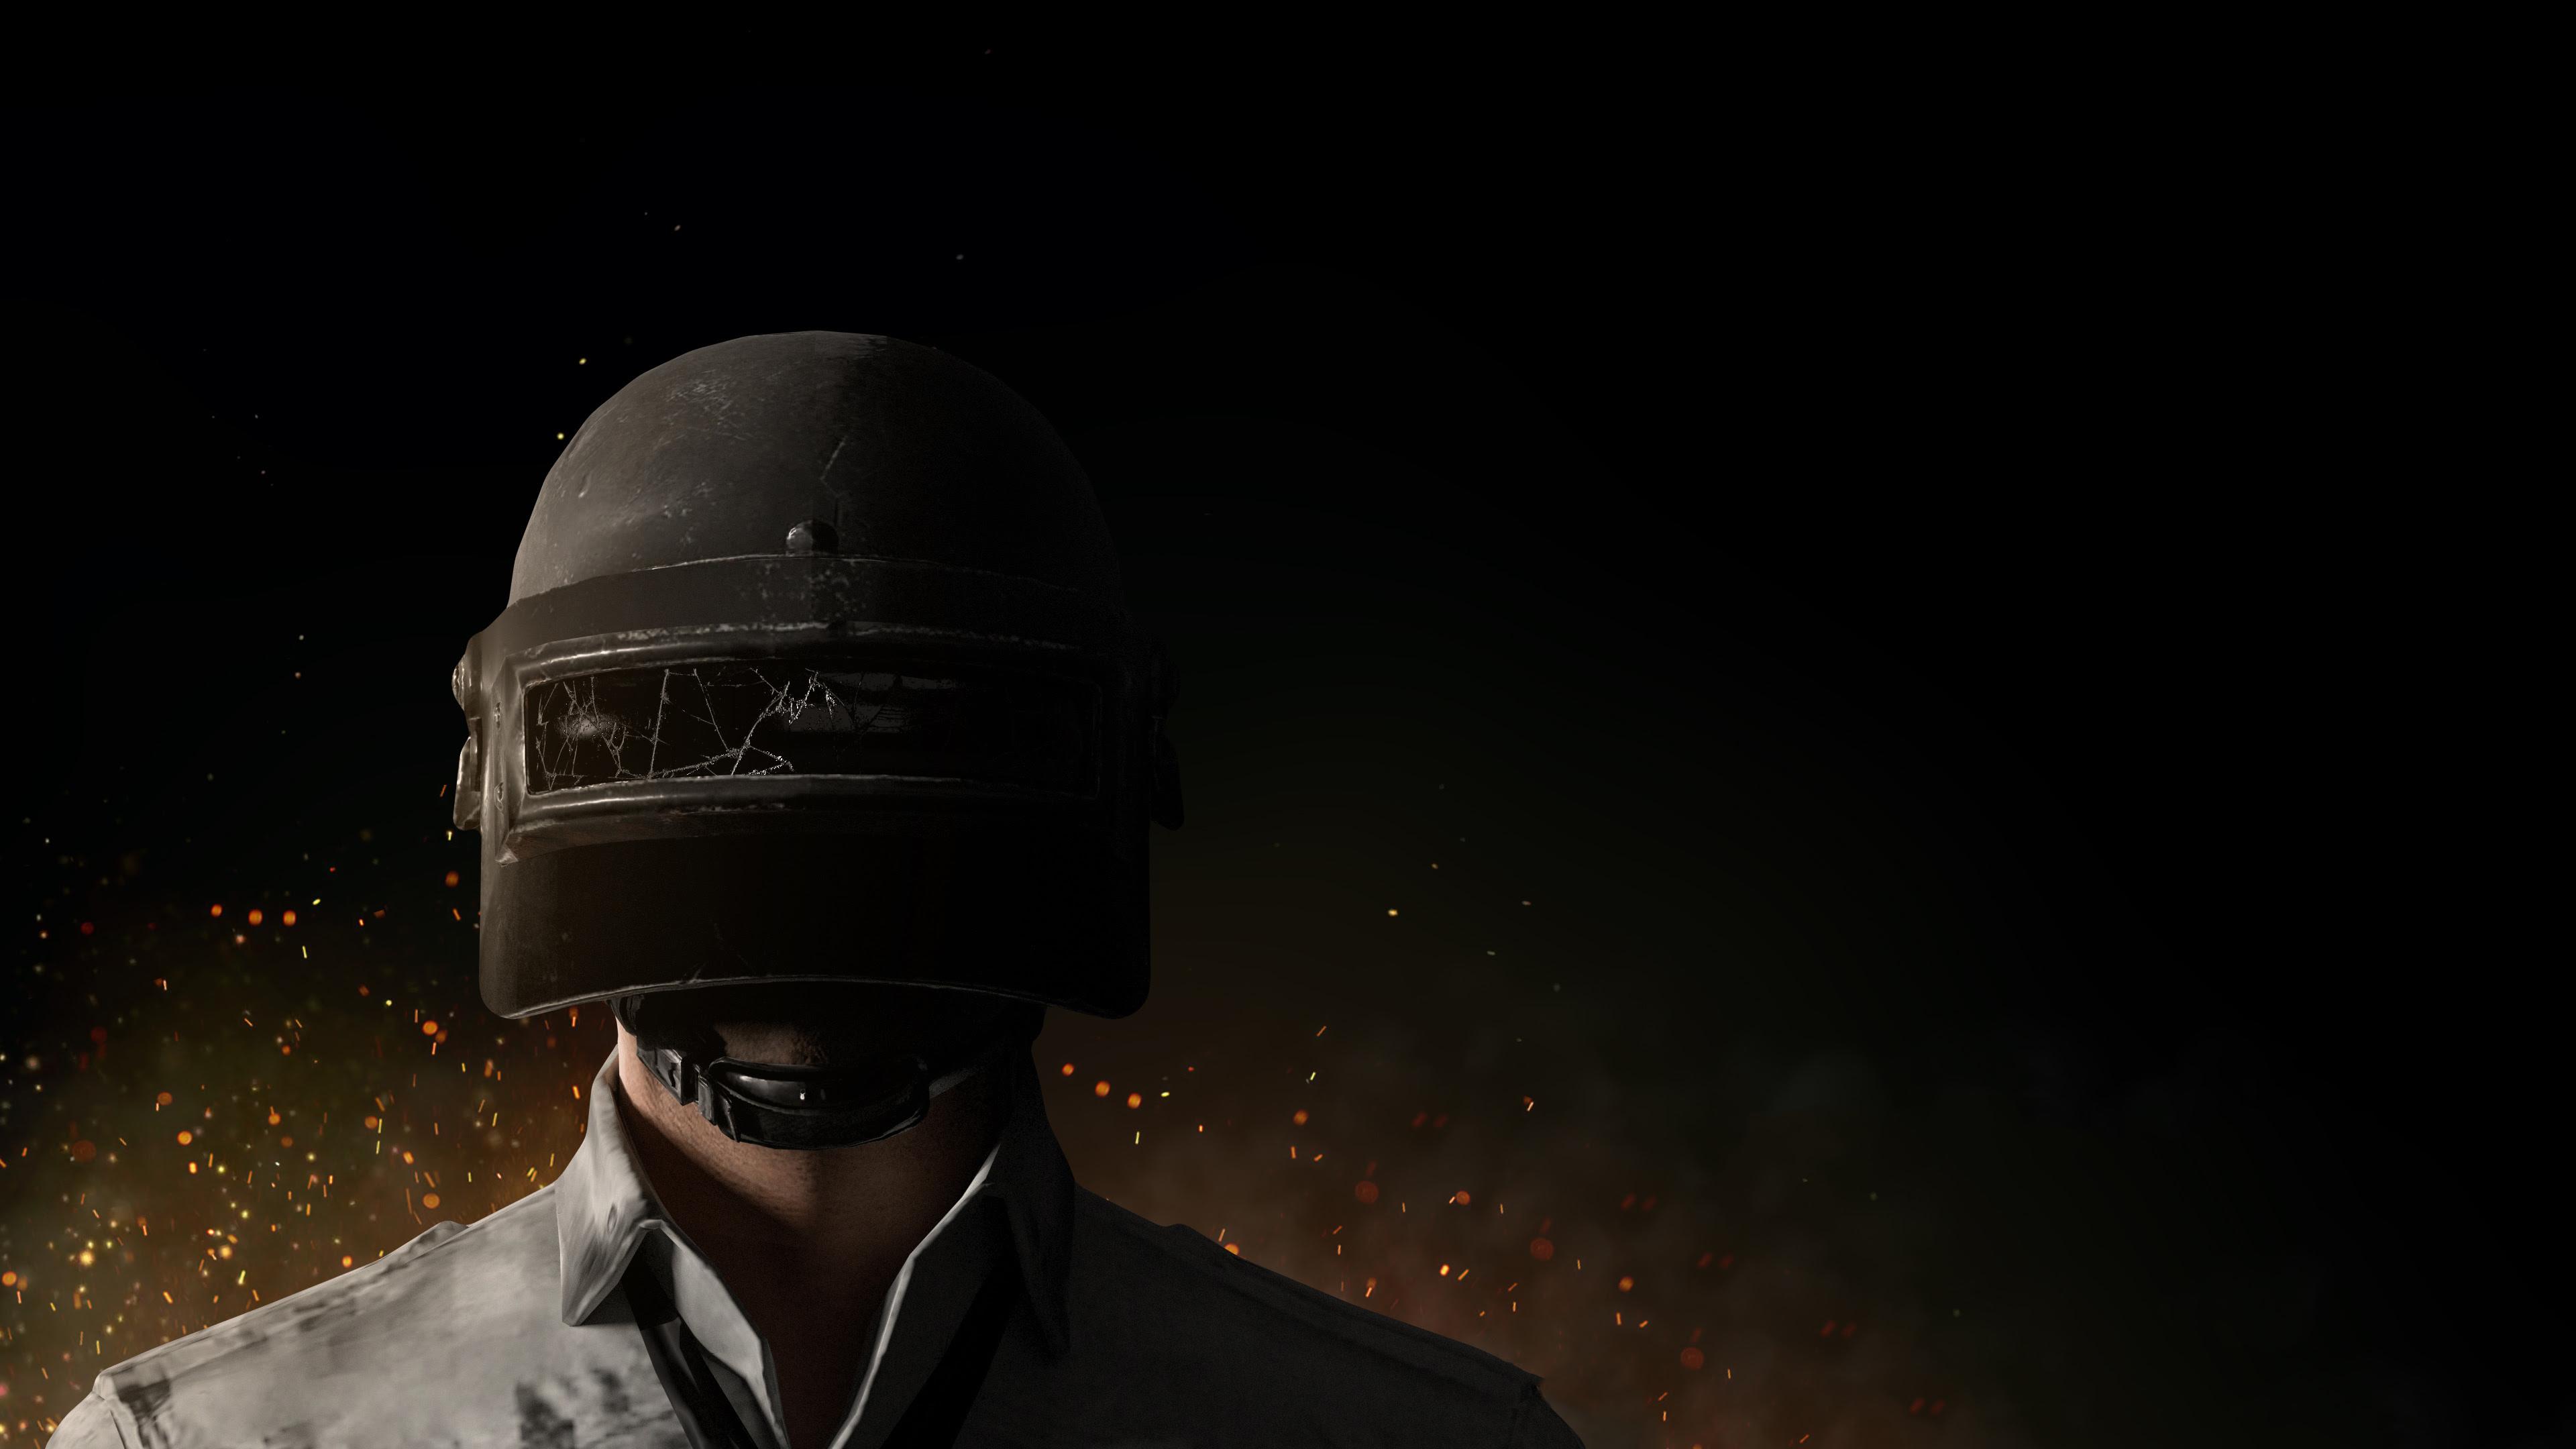 Pubg Helmet Guy 4k Hd Games 4k Wallpapers Images Backgrounds - pubg helmet guy 4k